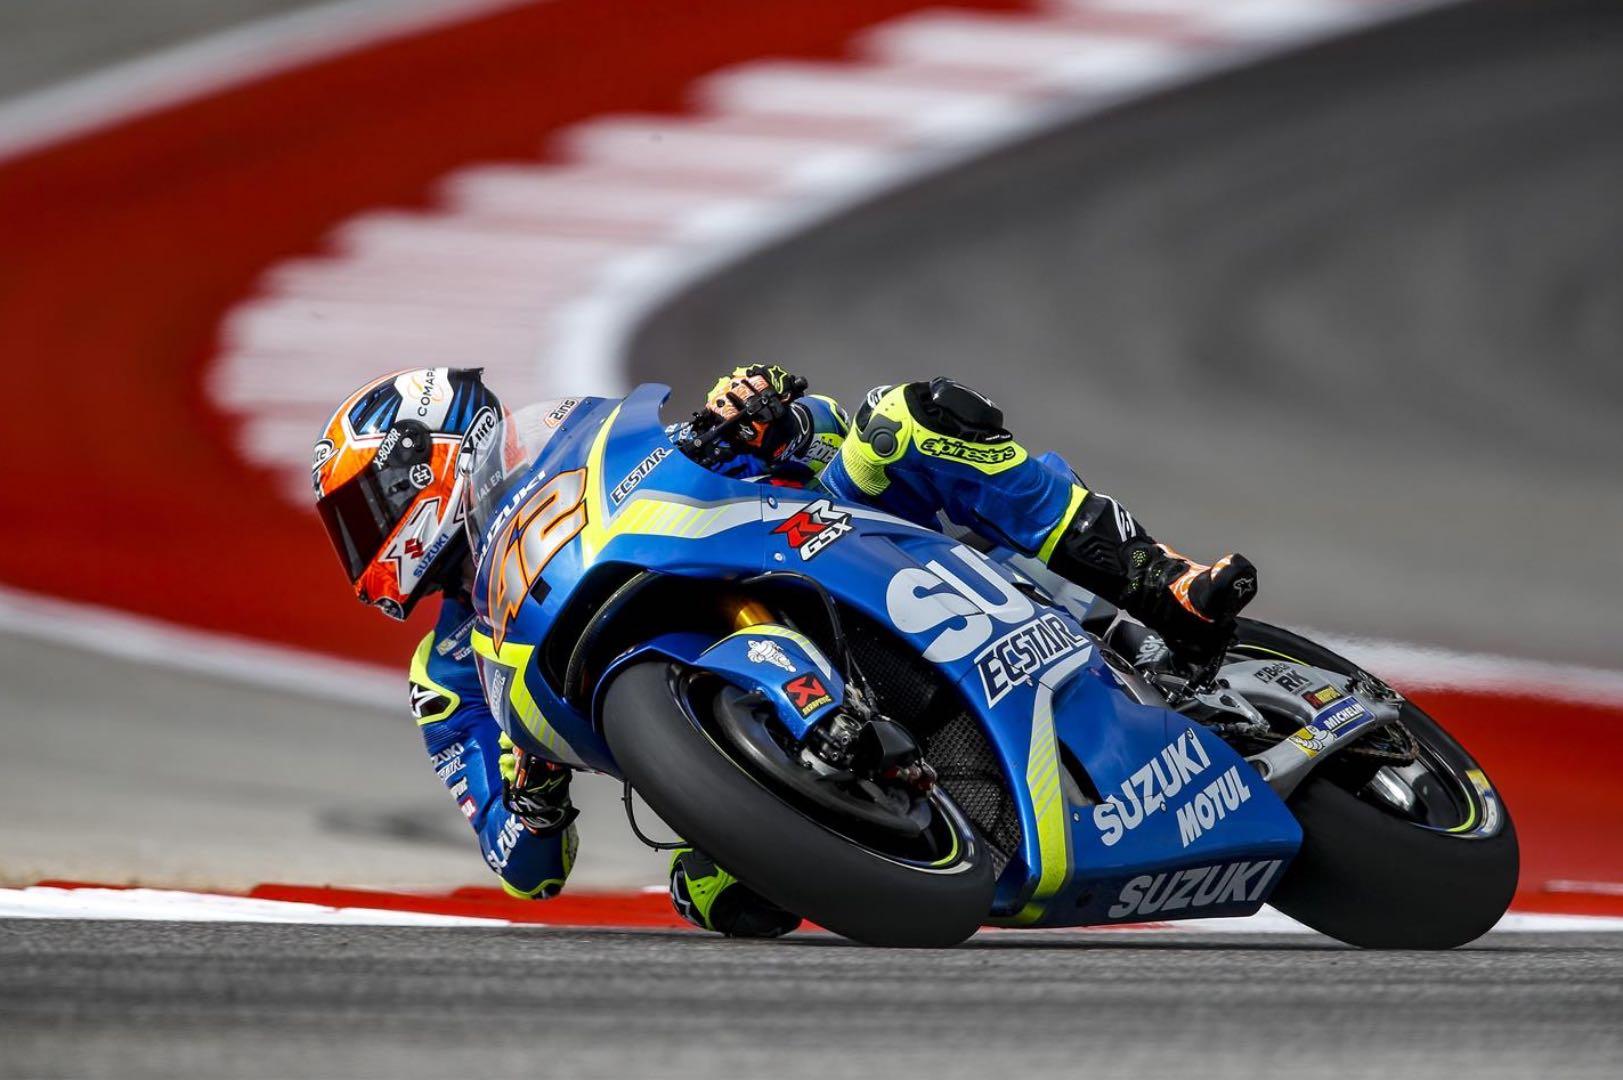 Suzuki's Alex Rins Breaks Wrist in COTA Crash; Out of Austin MotoGP